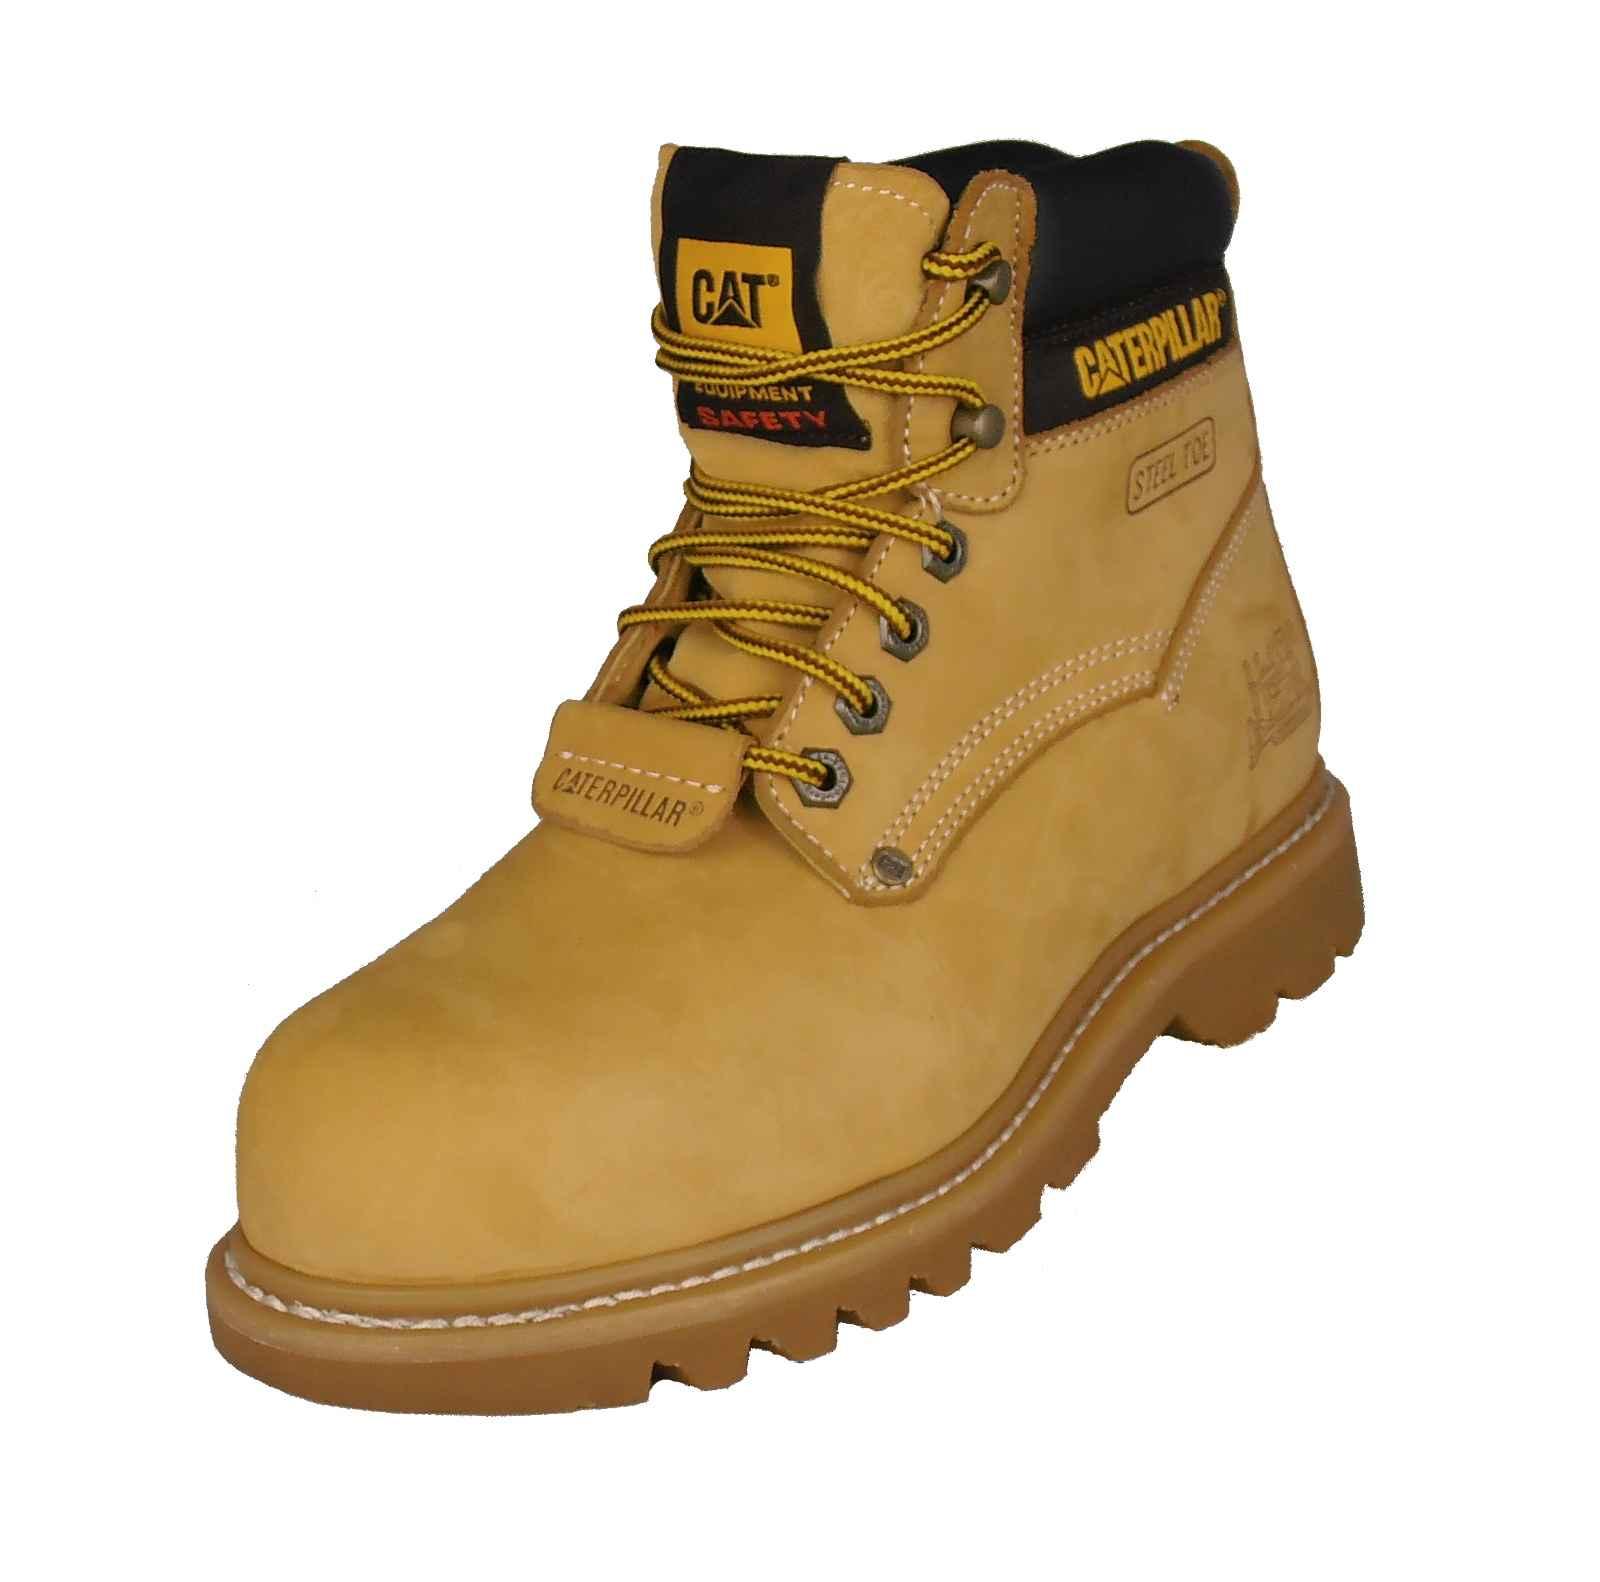 caterpillar shoes erbil weather in celsius